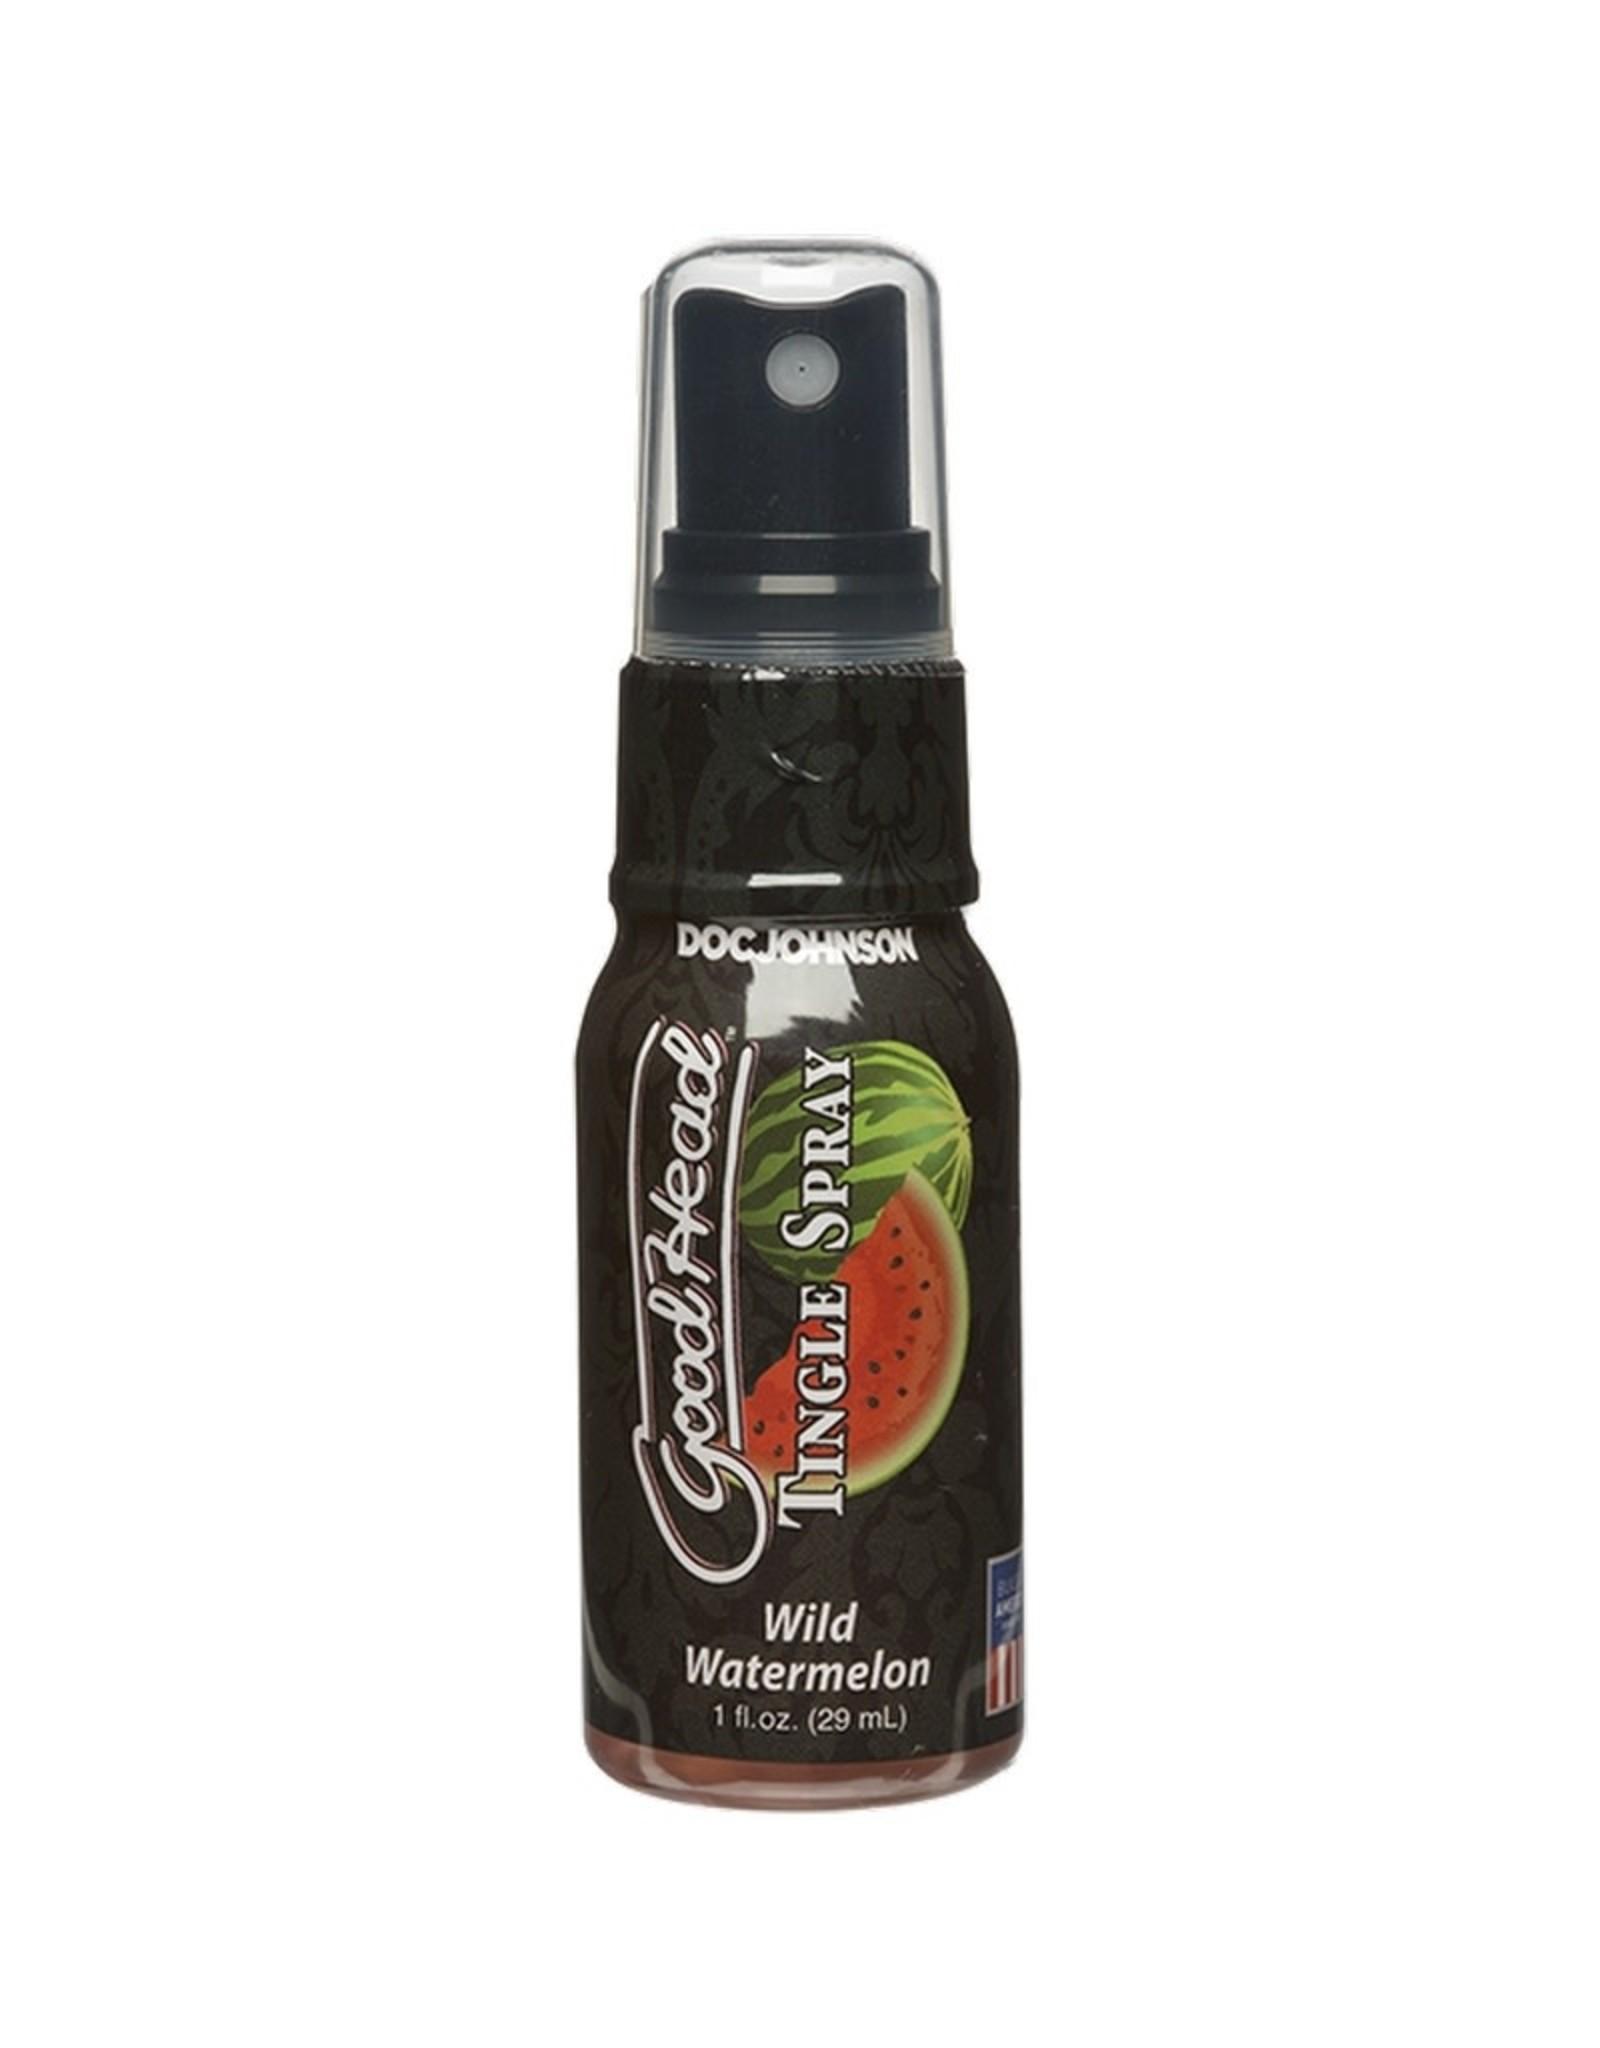 Doc Johnson Good Head - Tingle Spray - Wild Watermelon - 1 oz